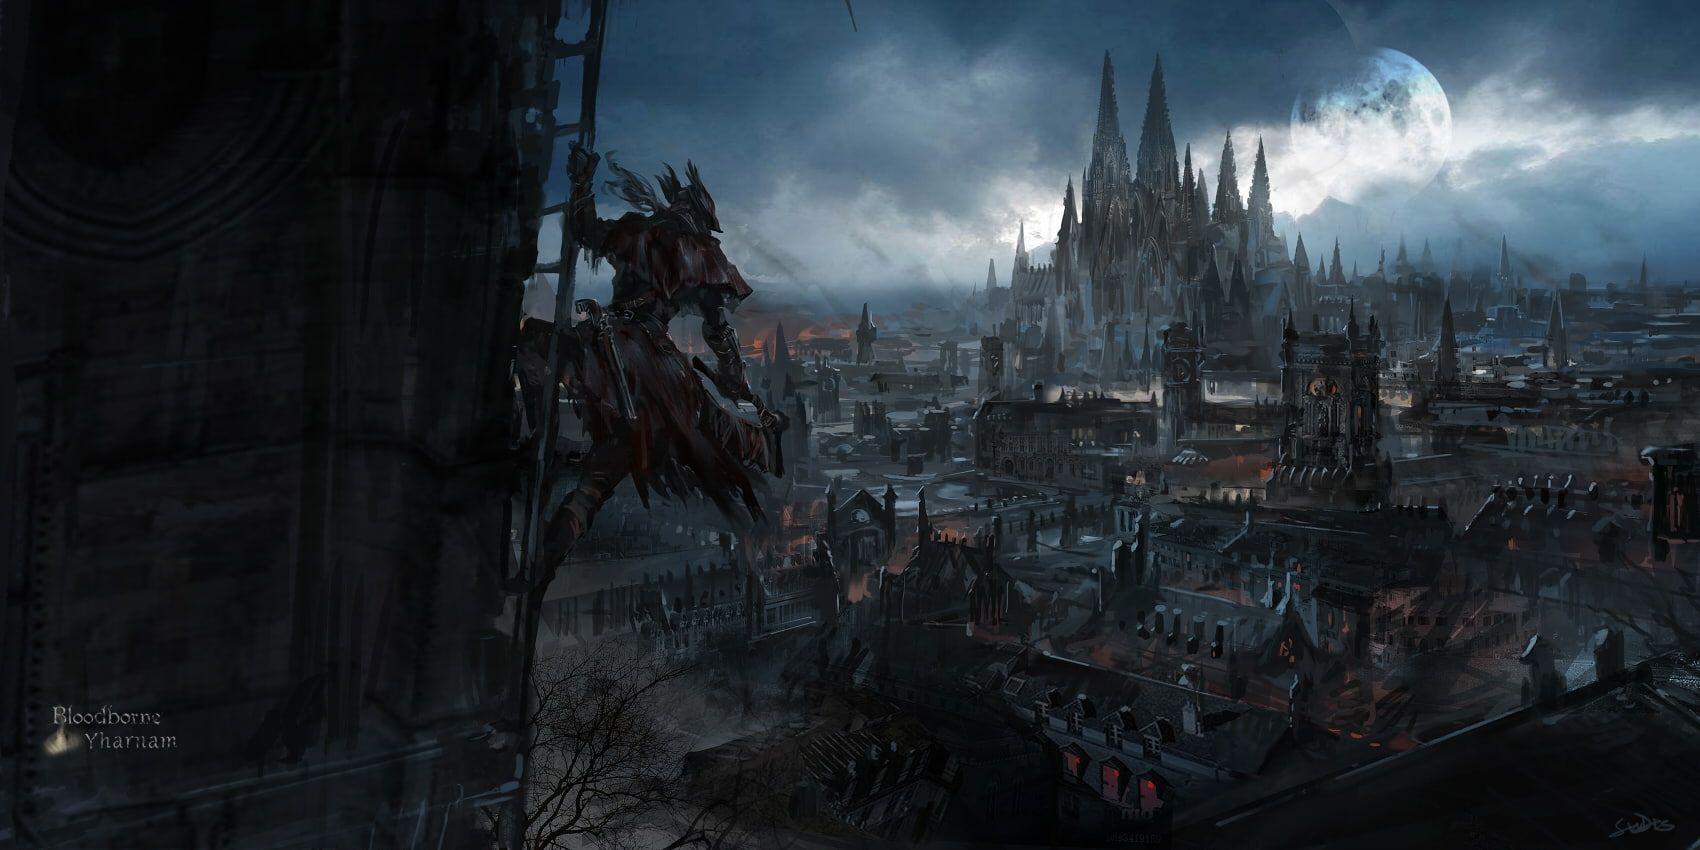 Bloodborne Yharnam Hunter Dark Moon Games 720p Wallpaper Hdwallpaper Desktop In 2020 Fantasy City Dark Wallpaper Bloodborne